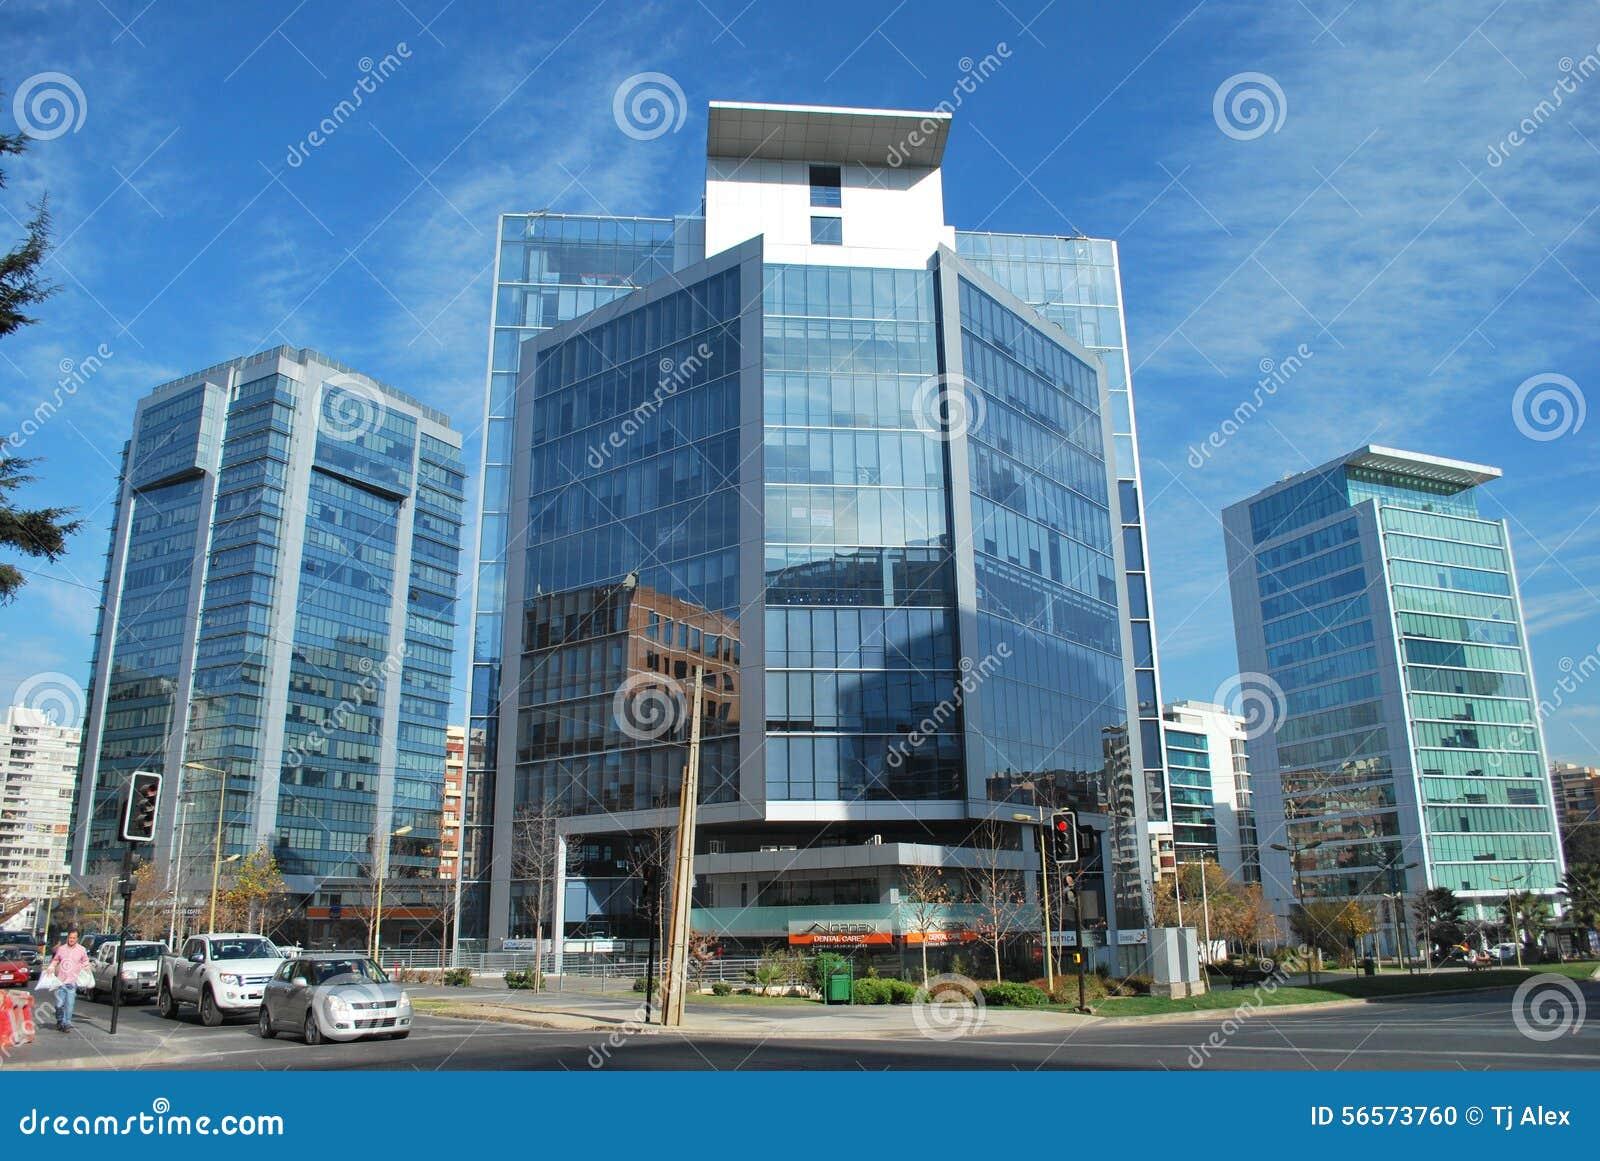 Download Καταπληκτικοί ουρανοξύστες στο Σαντιάγο, Χιλή Εκδοτική εικόνα - εικόνα από σαντιάγο, πόλη: 56573760